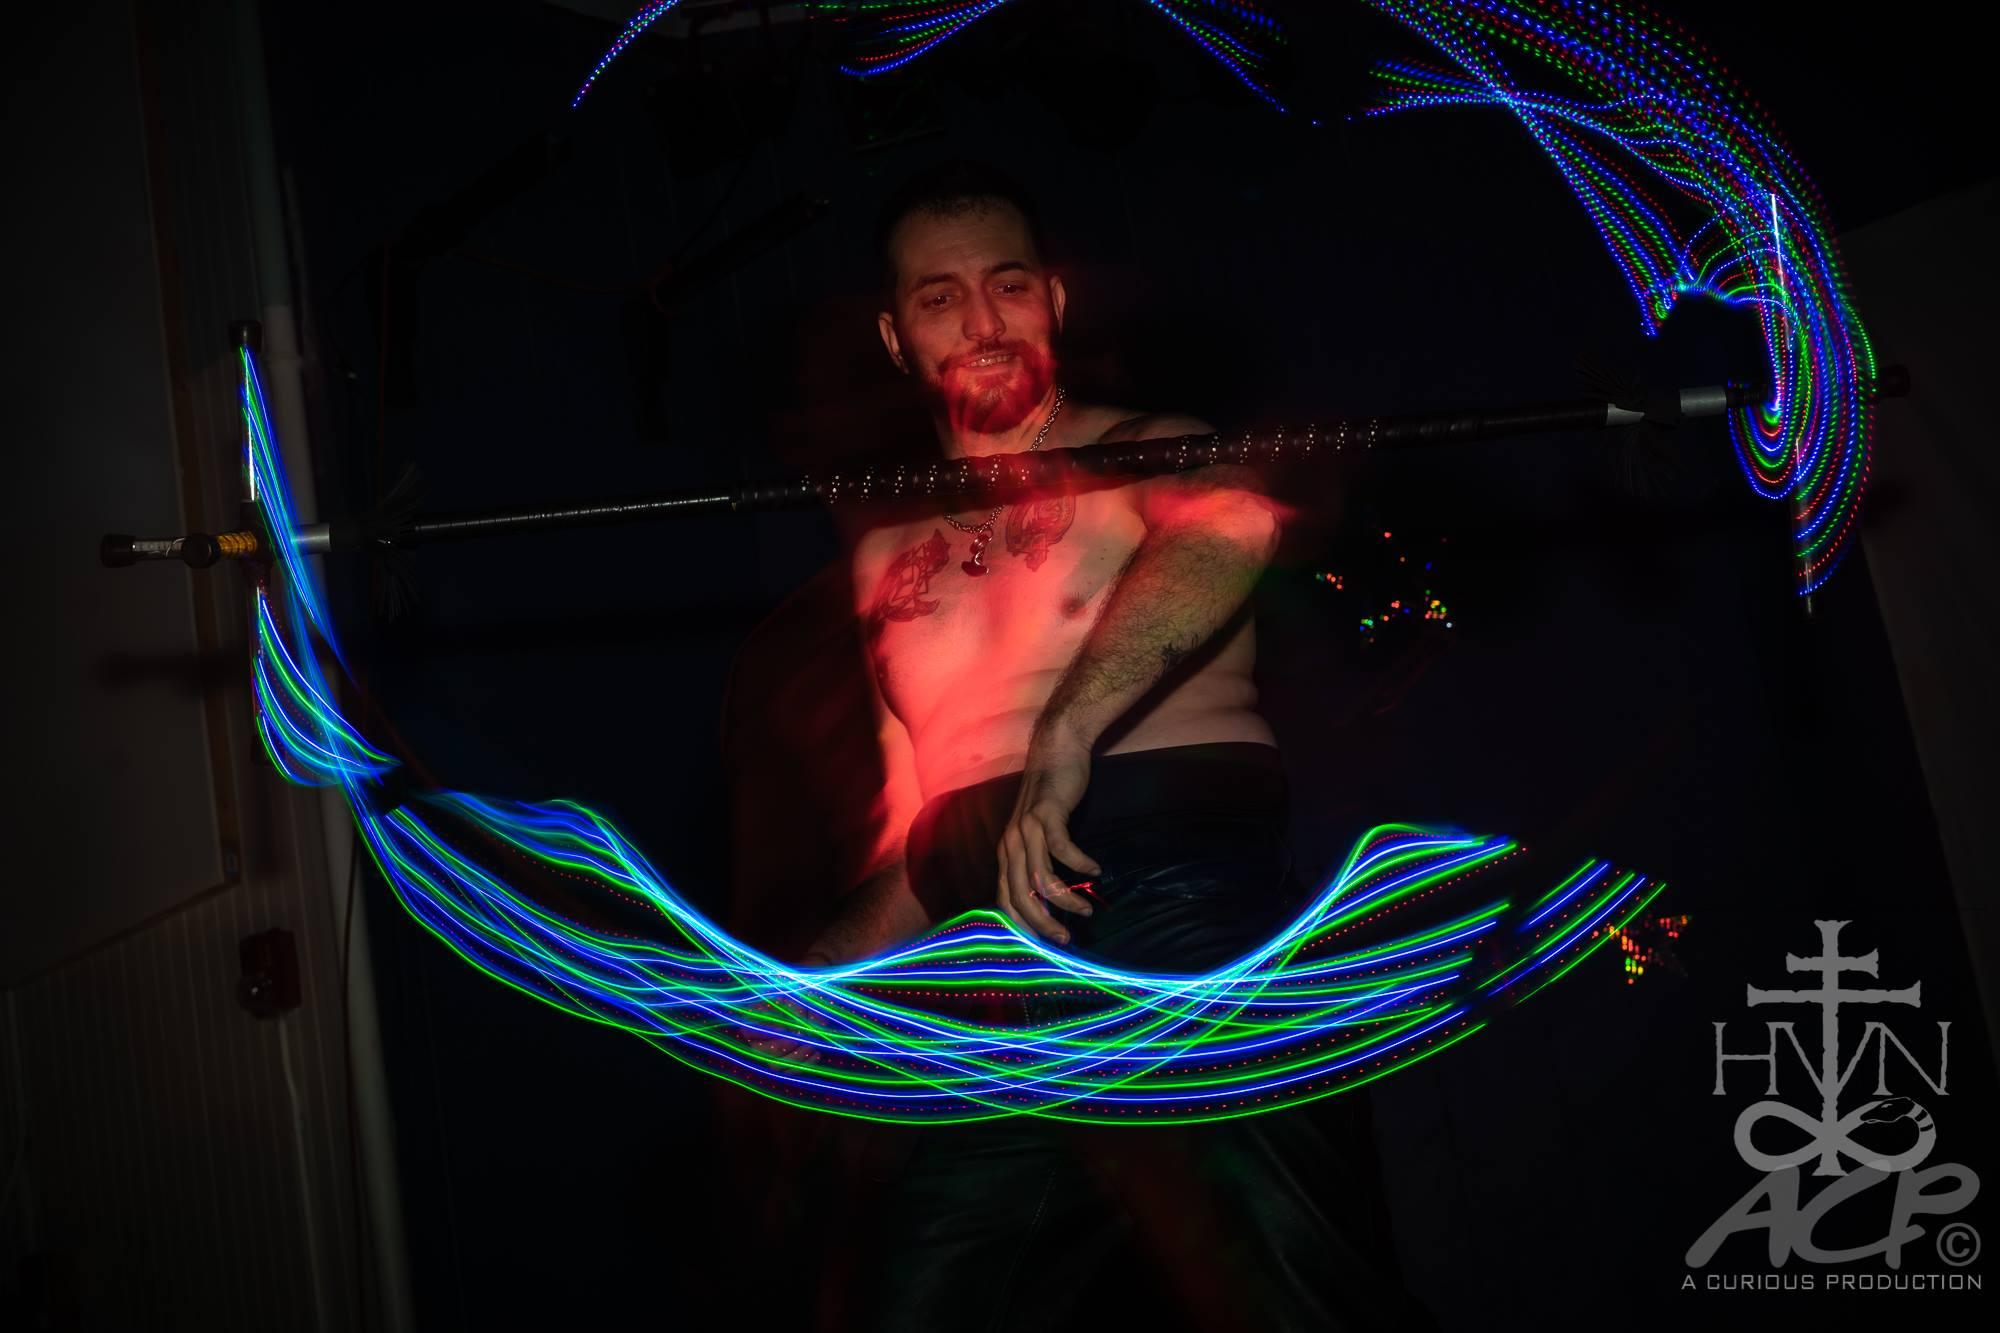 TheHavenClub-Goth-Industrial-Dance-Alternative-Northampton-MA-Exotic Erotic 2018 (93).jpg